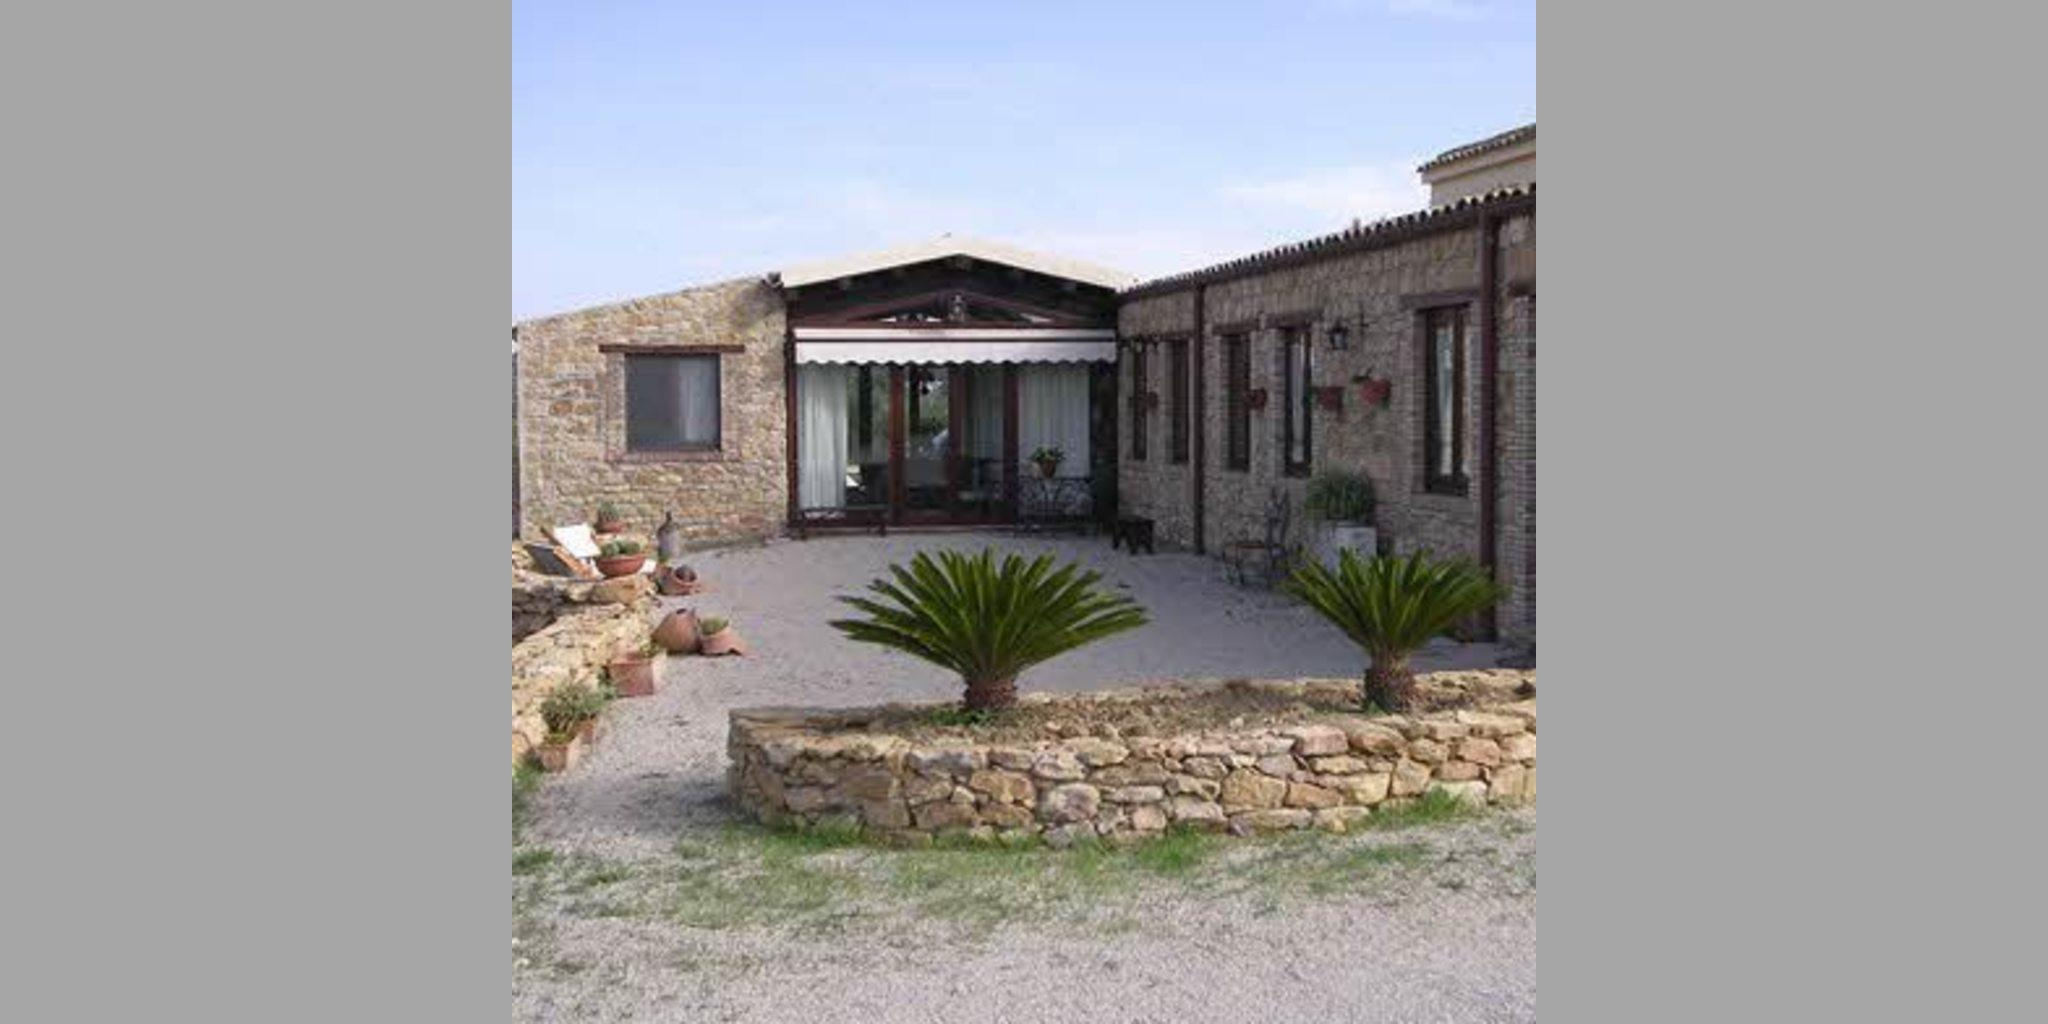 Bed & Breakfast Caltanissetta - Serra Dei Ladroni